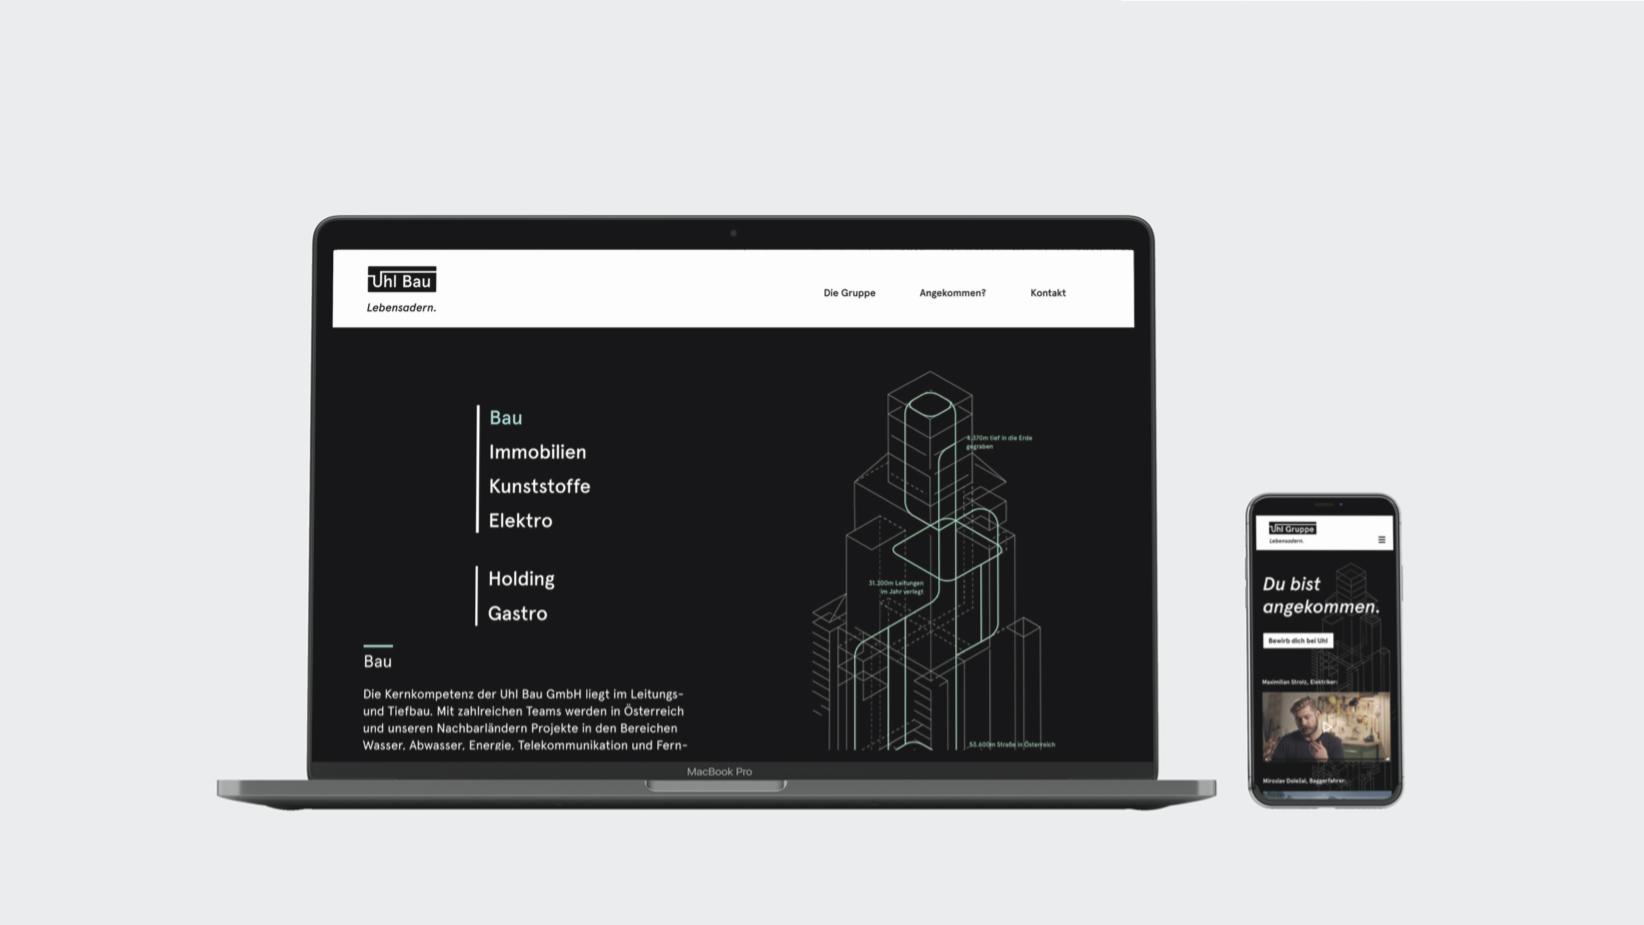 2 Stella Butz Stefan Kinateder Uhl Corporate Design Web